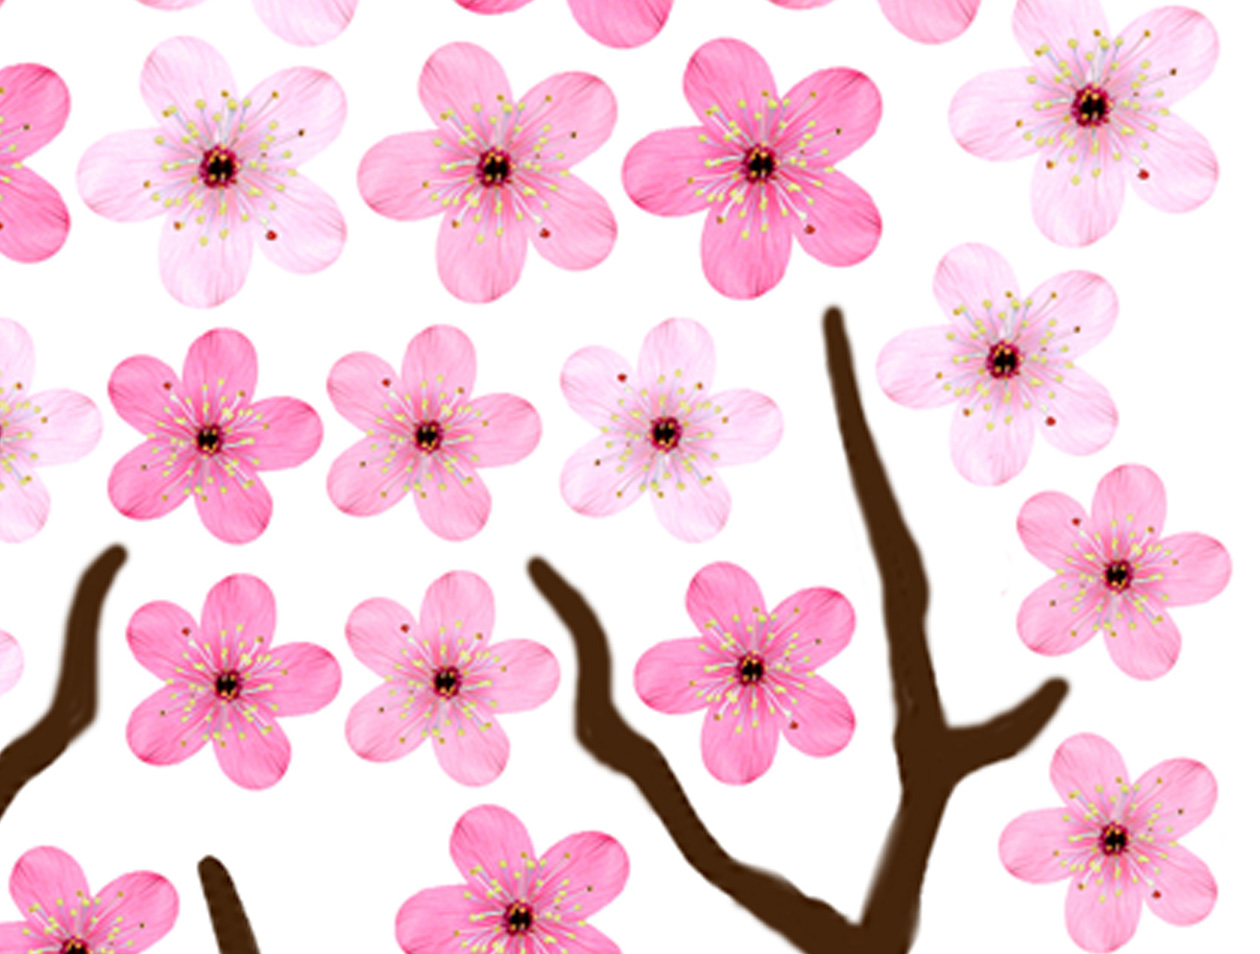 Wafer Paper Cherry Blossom